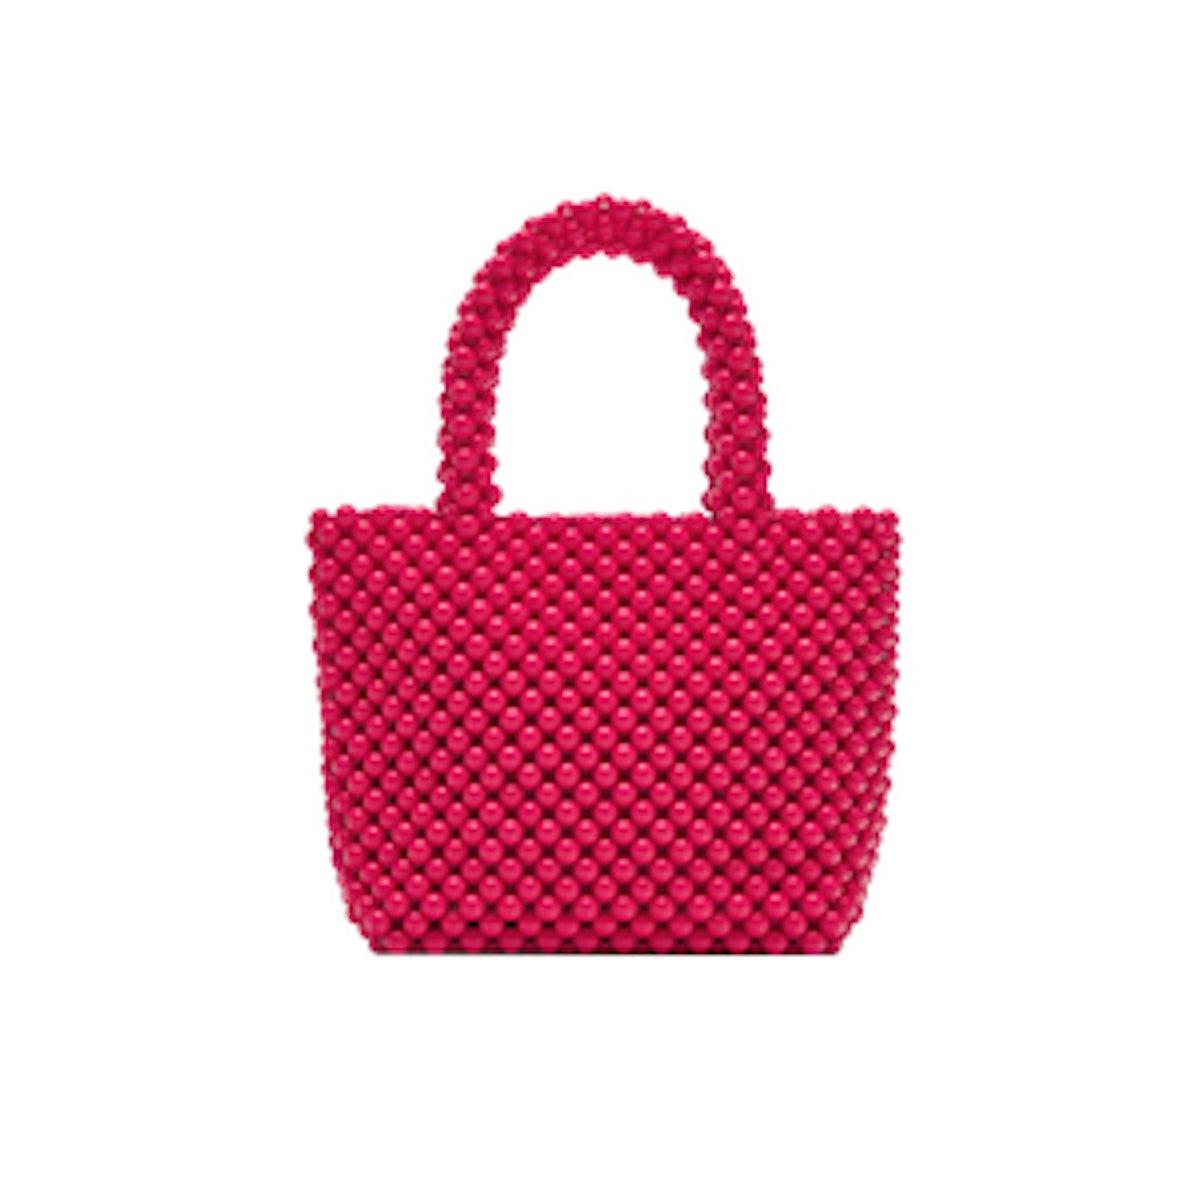 Mini Tote Bag With Studs